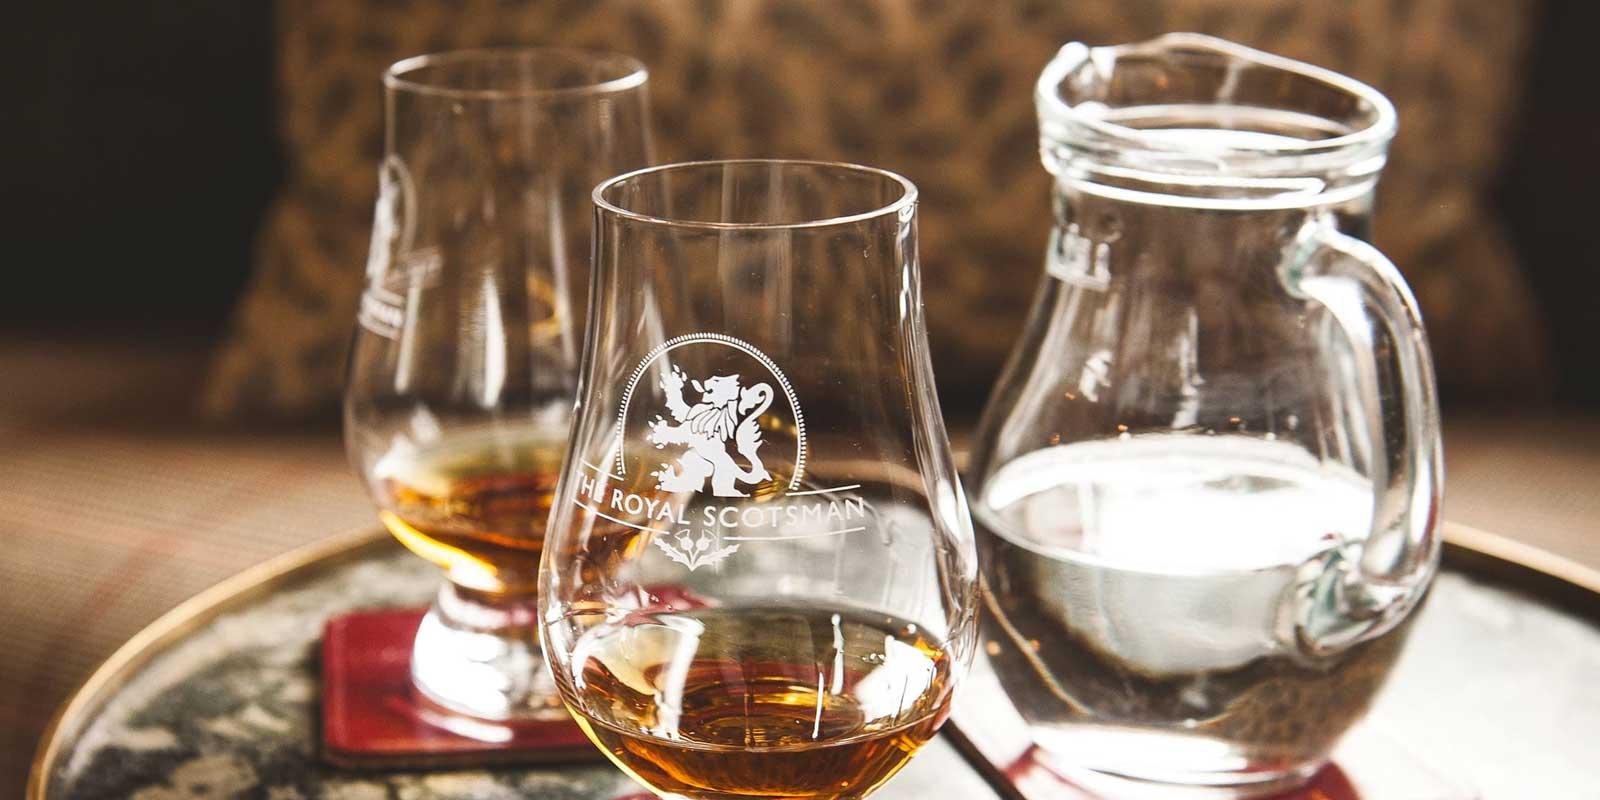 Scotch Malt Whisky Tour